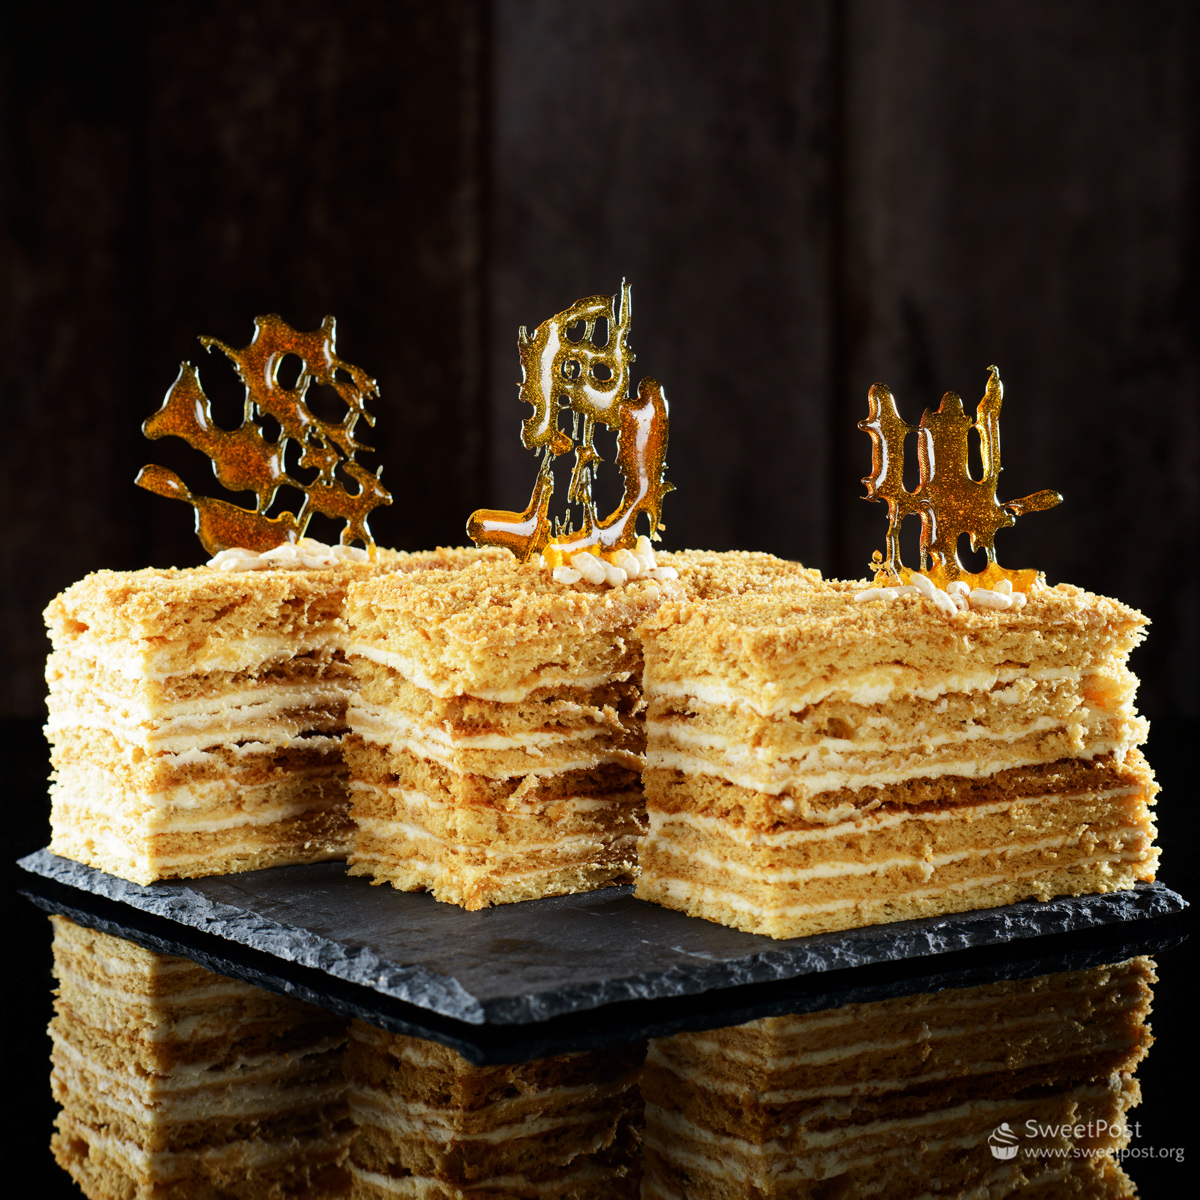 Small honey cake